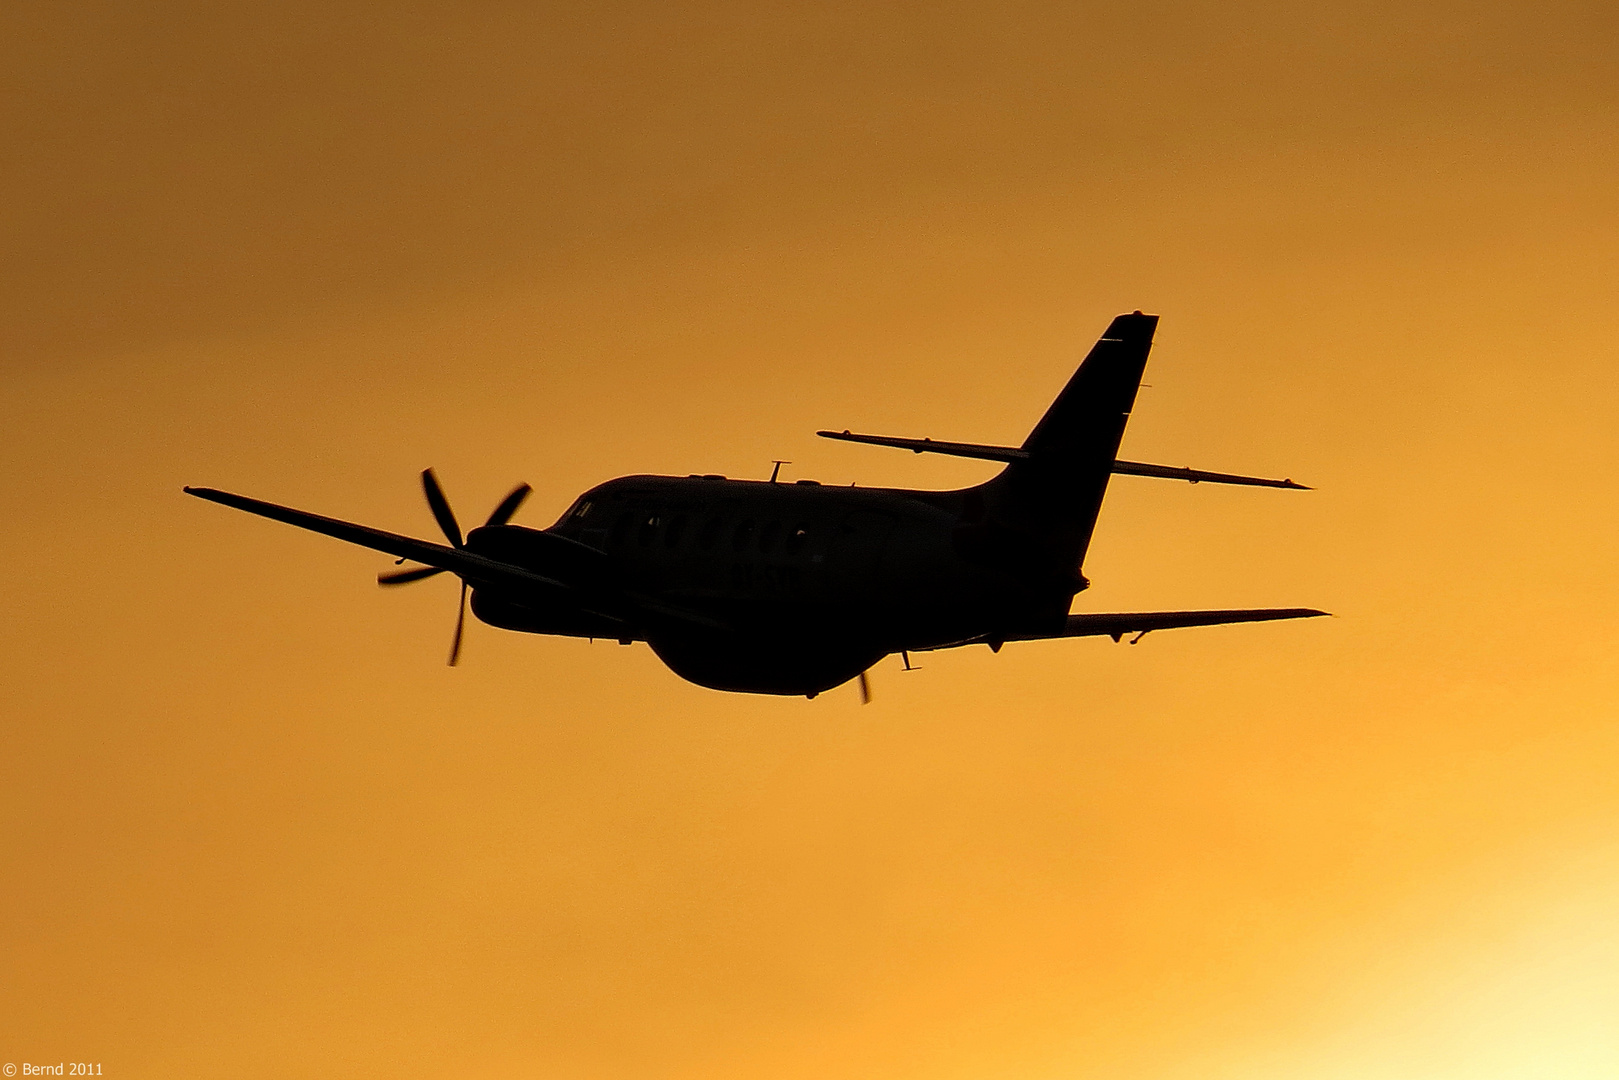 Sun-Air of Scandinavia - British Aerospace Jetstream 32, OY-SVB